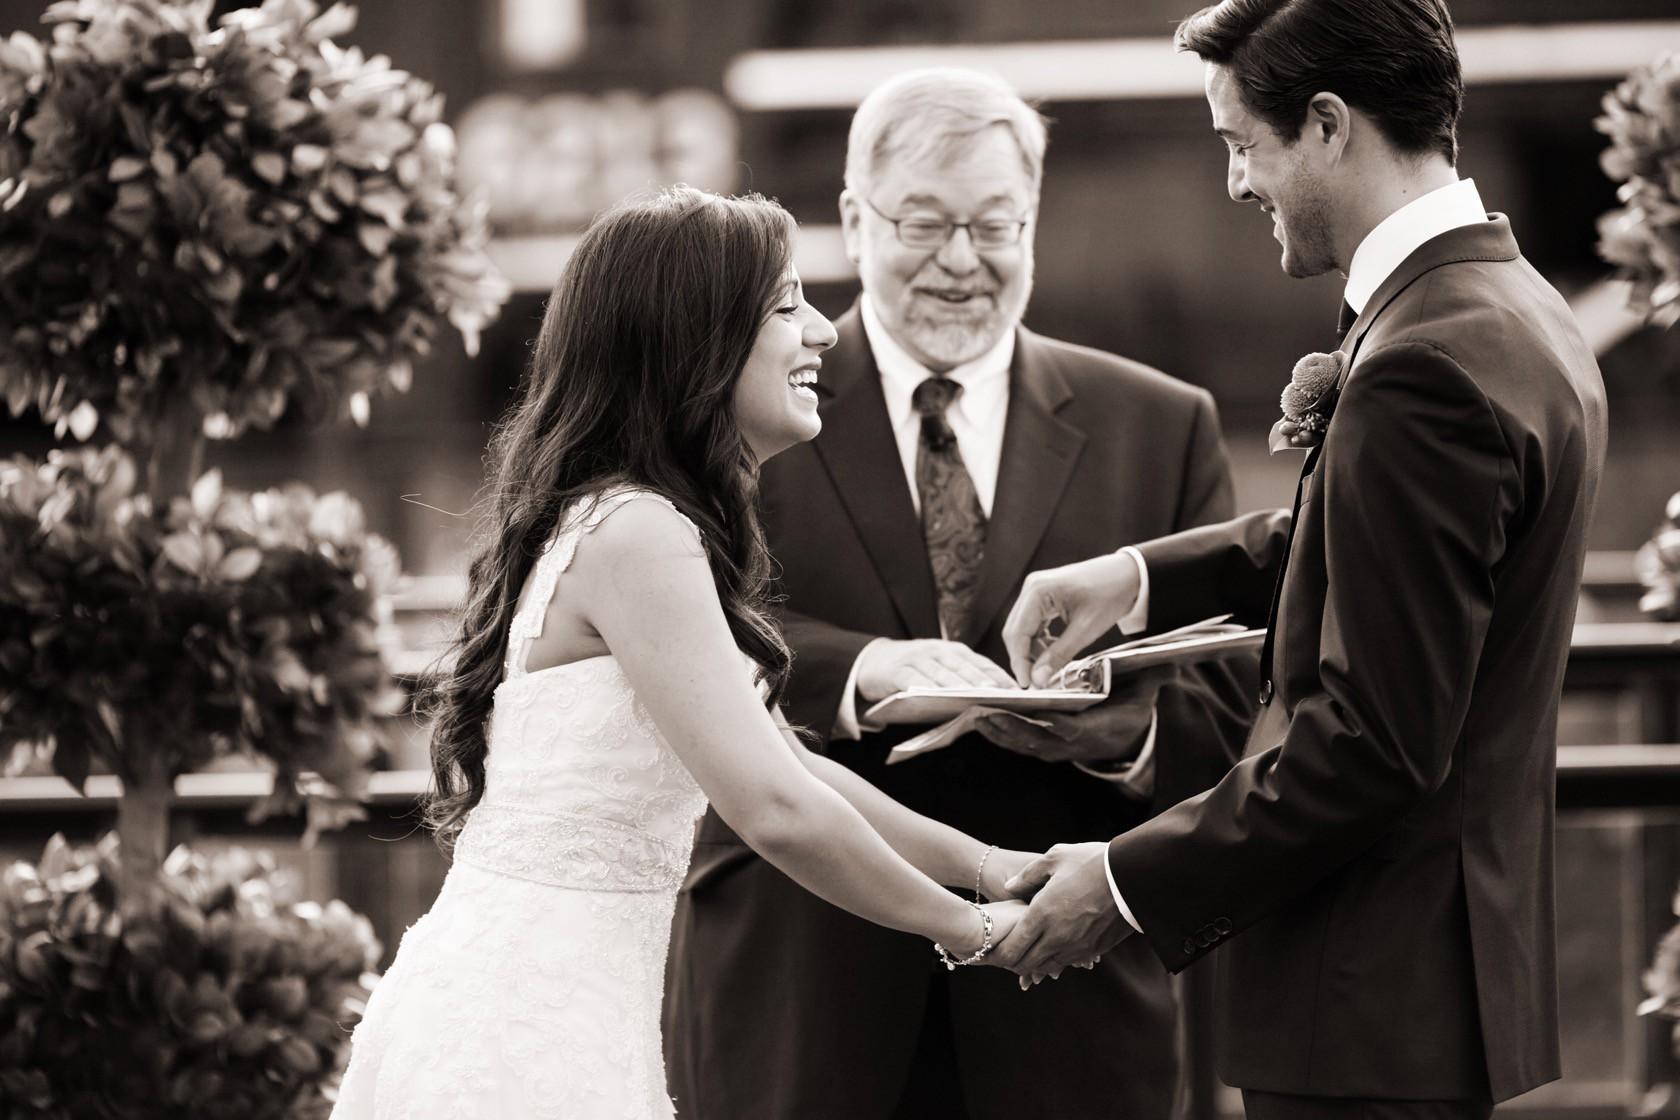 stephen sager photography 0008 fine art wedding photography